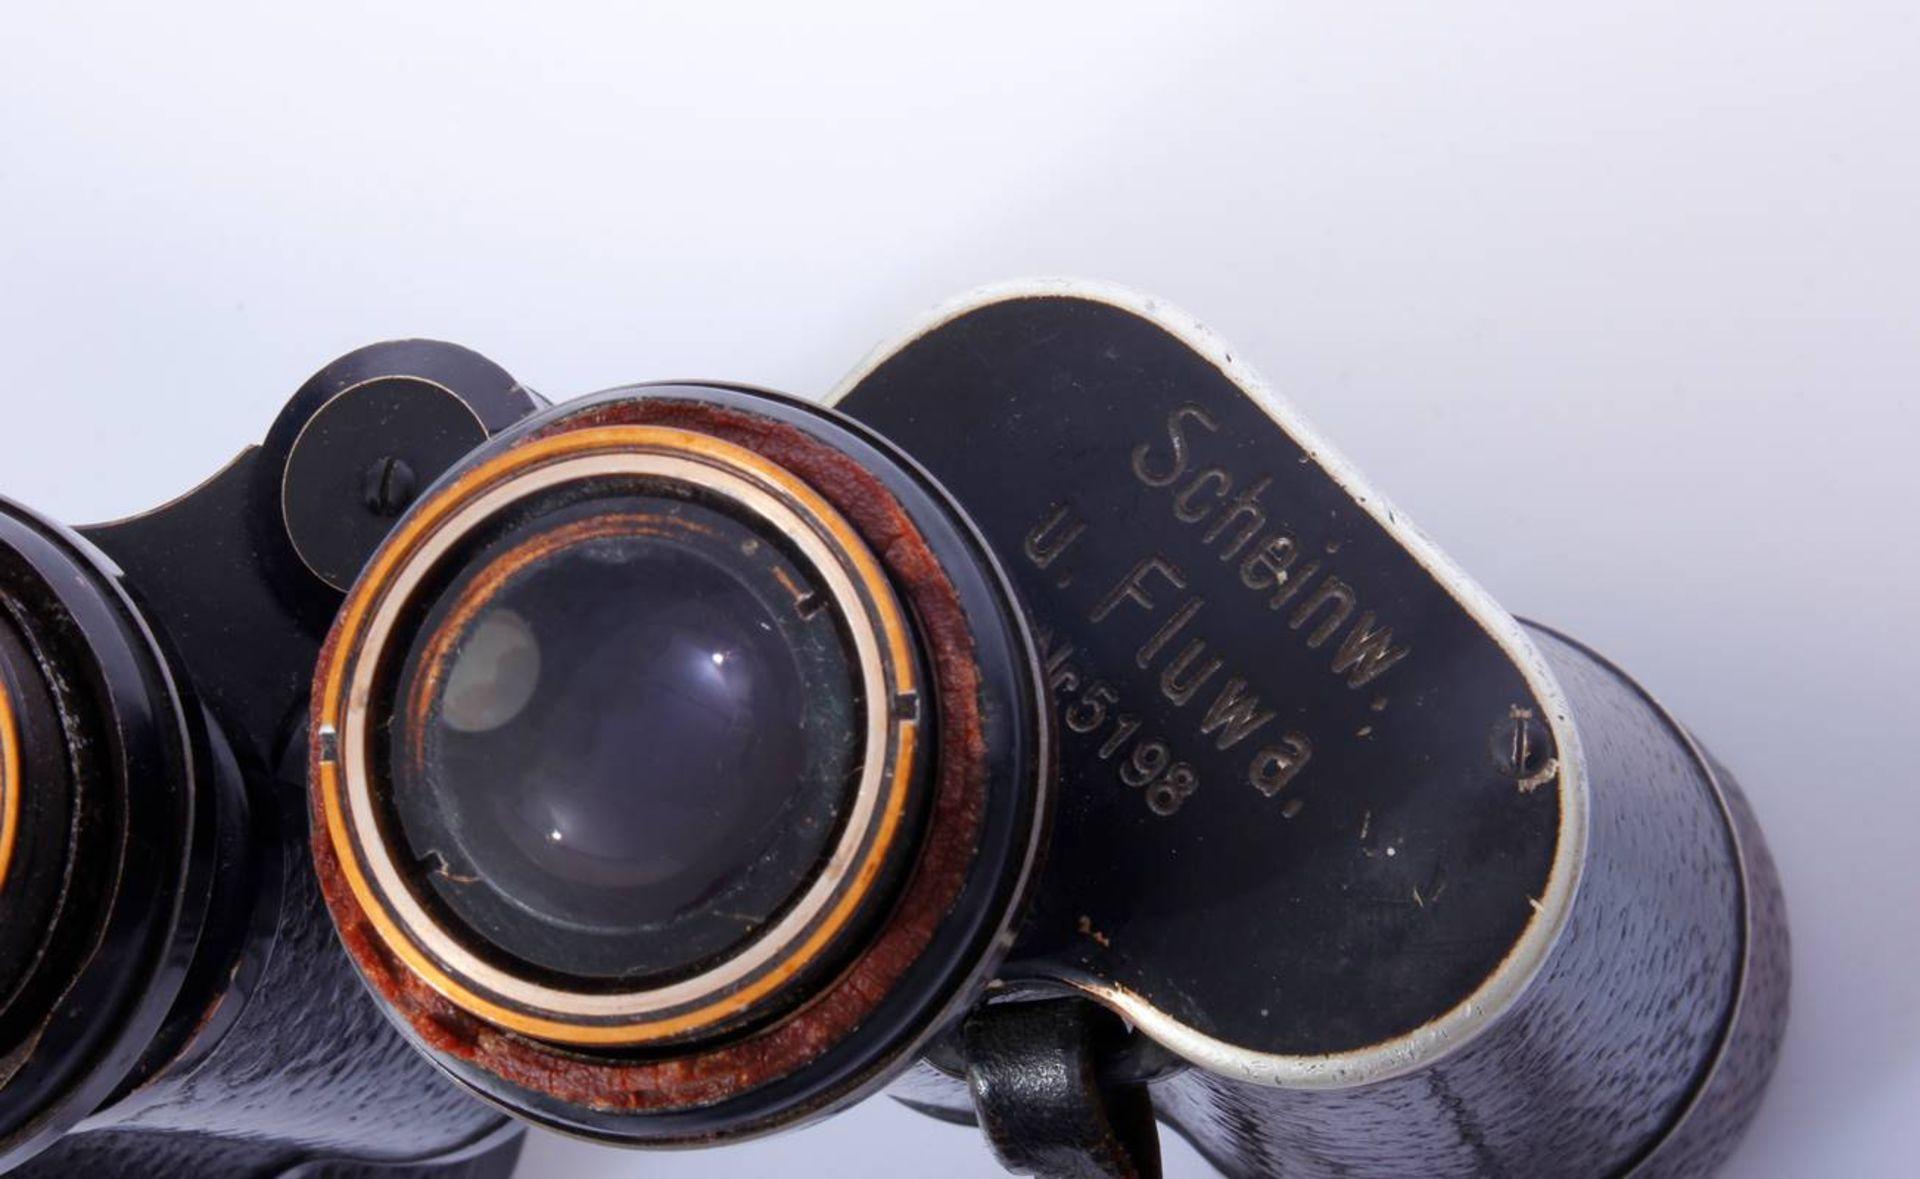 Marinefernglas DE 7 x 50Schwarzes Marinefernglas 7 x 50 DE Karl Zeiss Jena mit Abnahmestempel, - Bild 6 aus 7